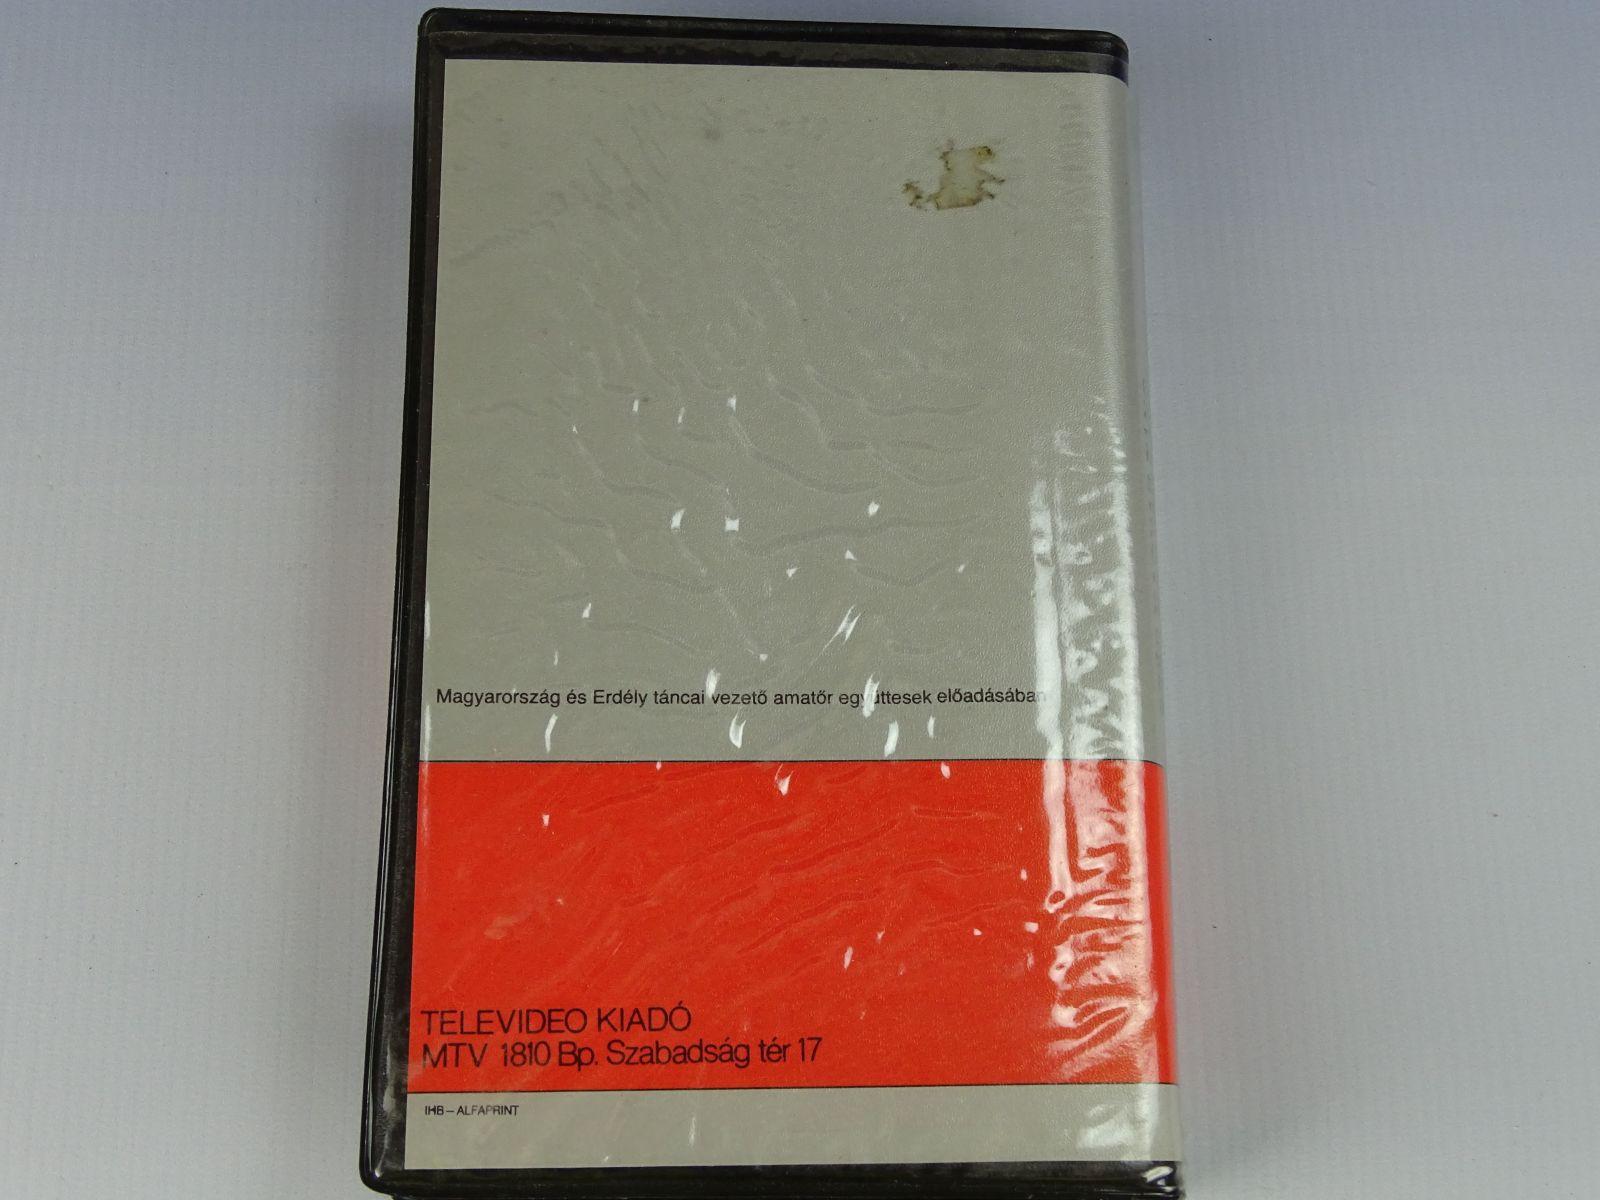 DSC07781.JPG (1600�1200)